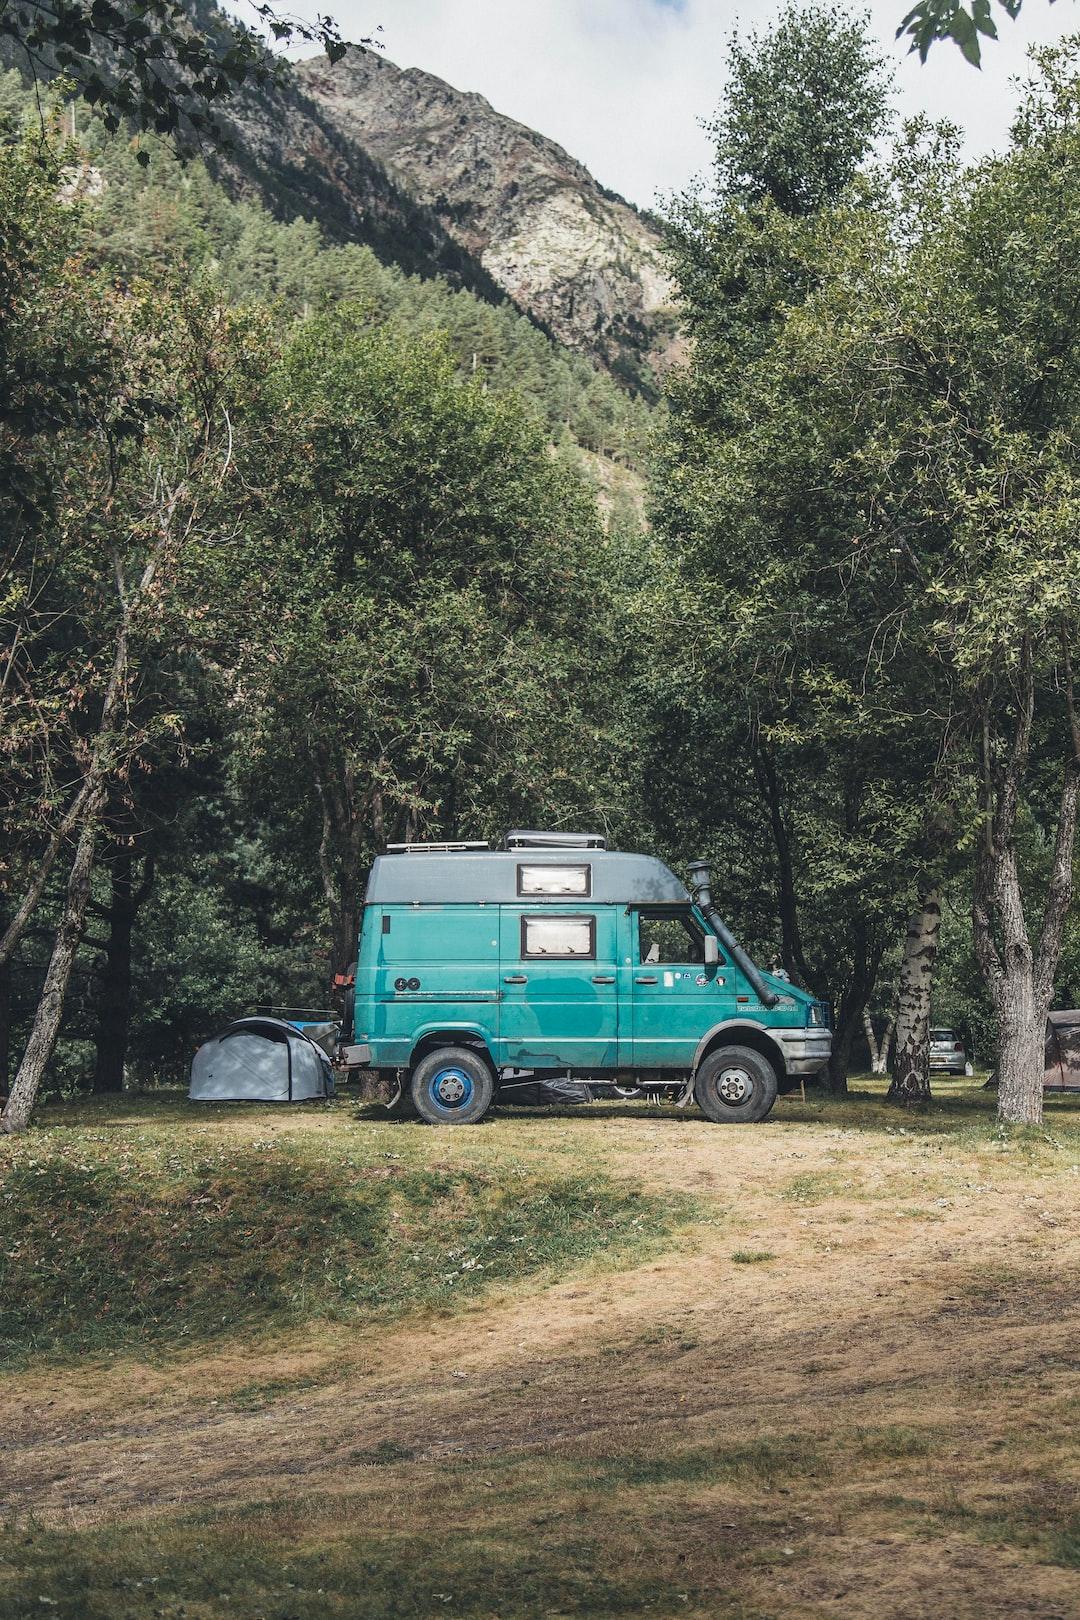 Campingurlaub mit dem Wohnmobil